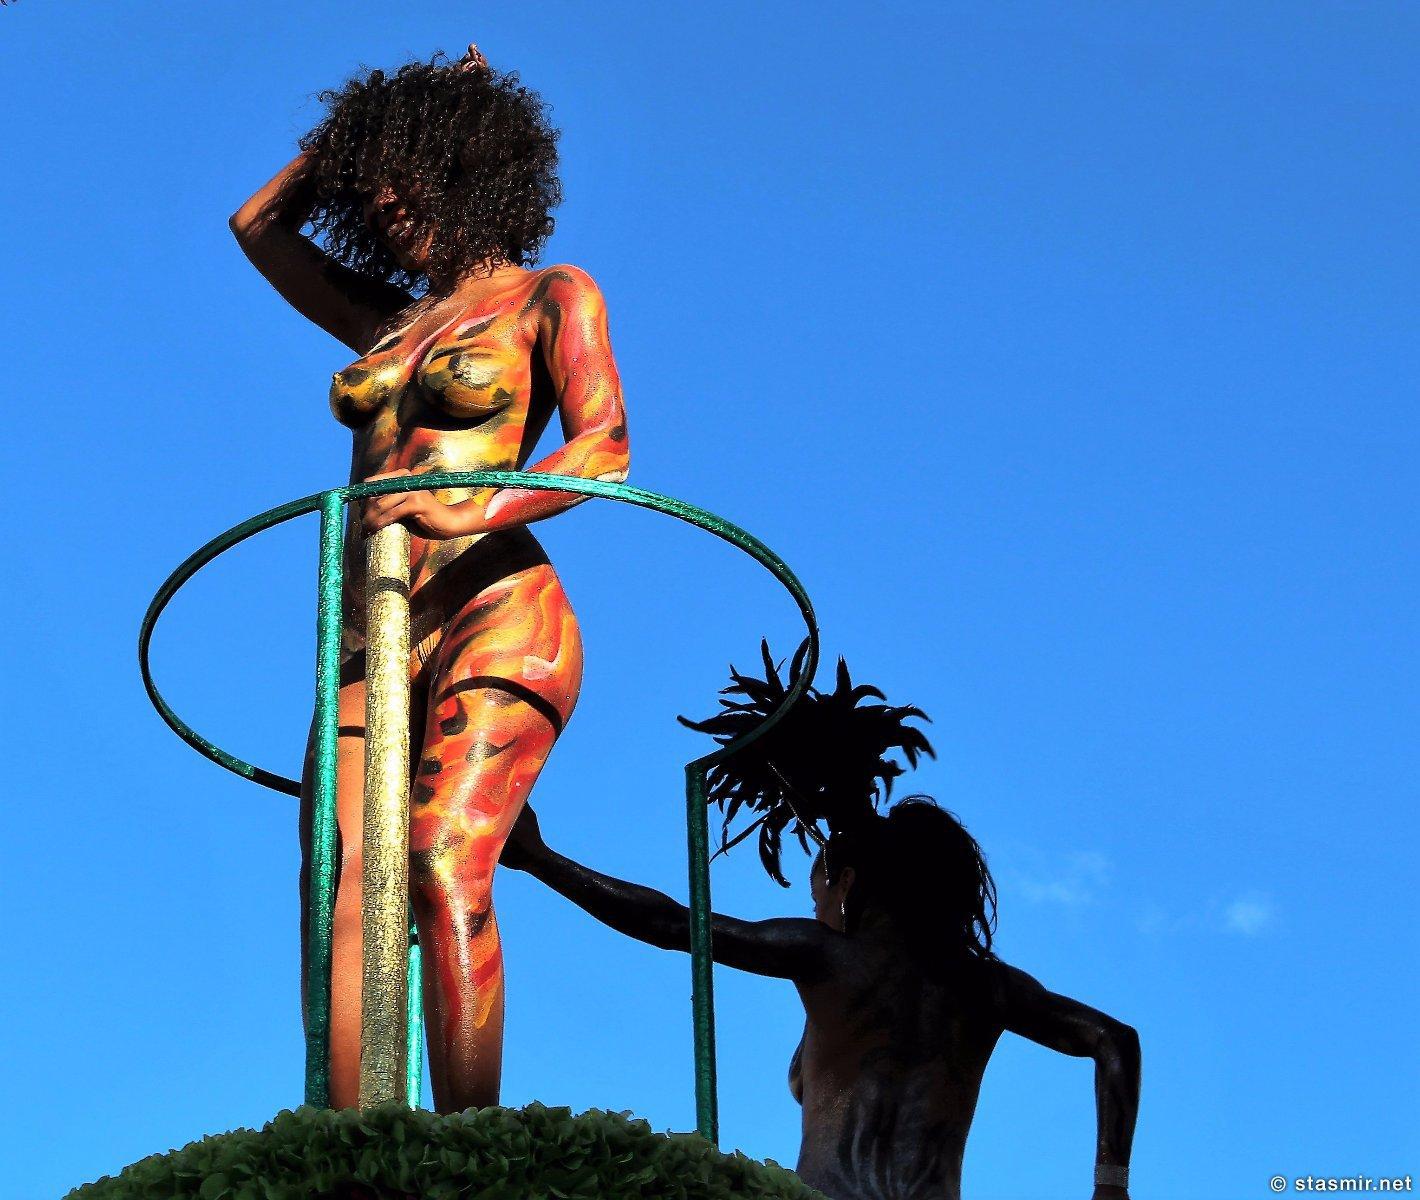 Тема сисек хорошо раскрыта на карнавале в Луле, Алгарве, Португалия, фото Стасмир, photo Stasmir